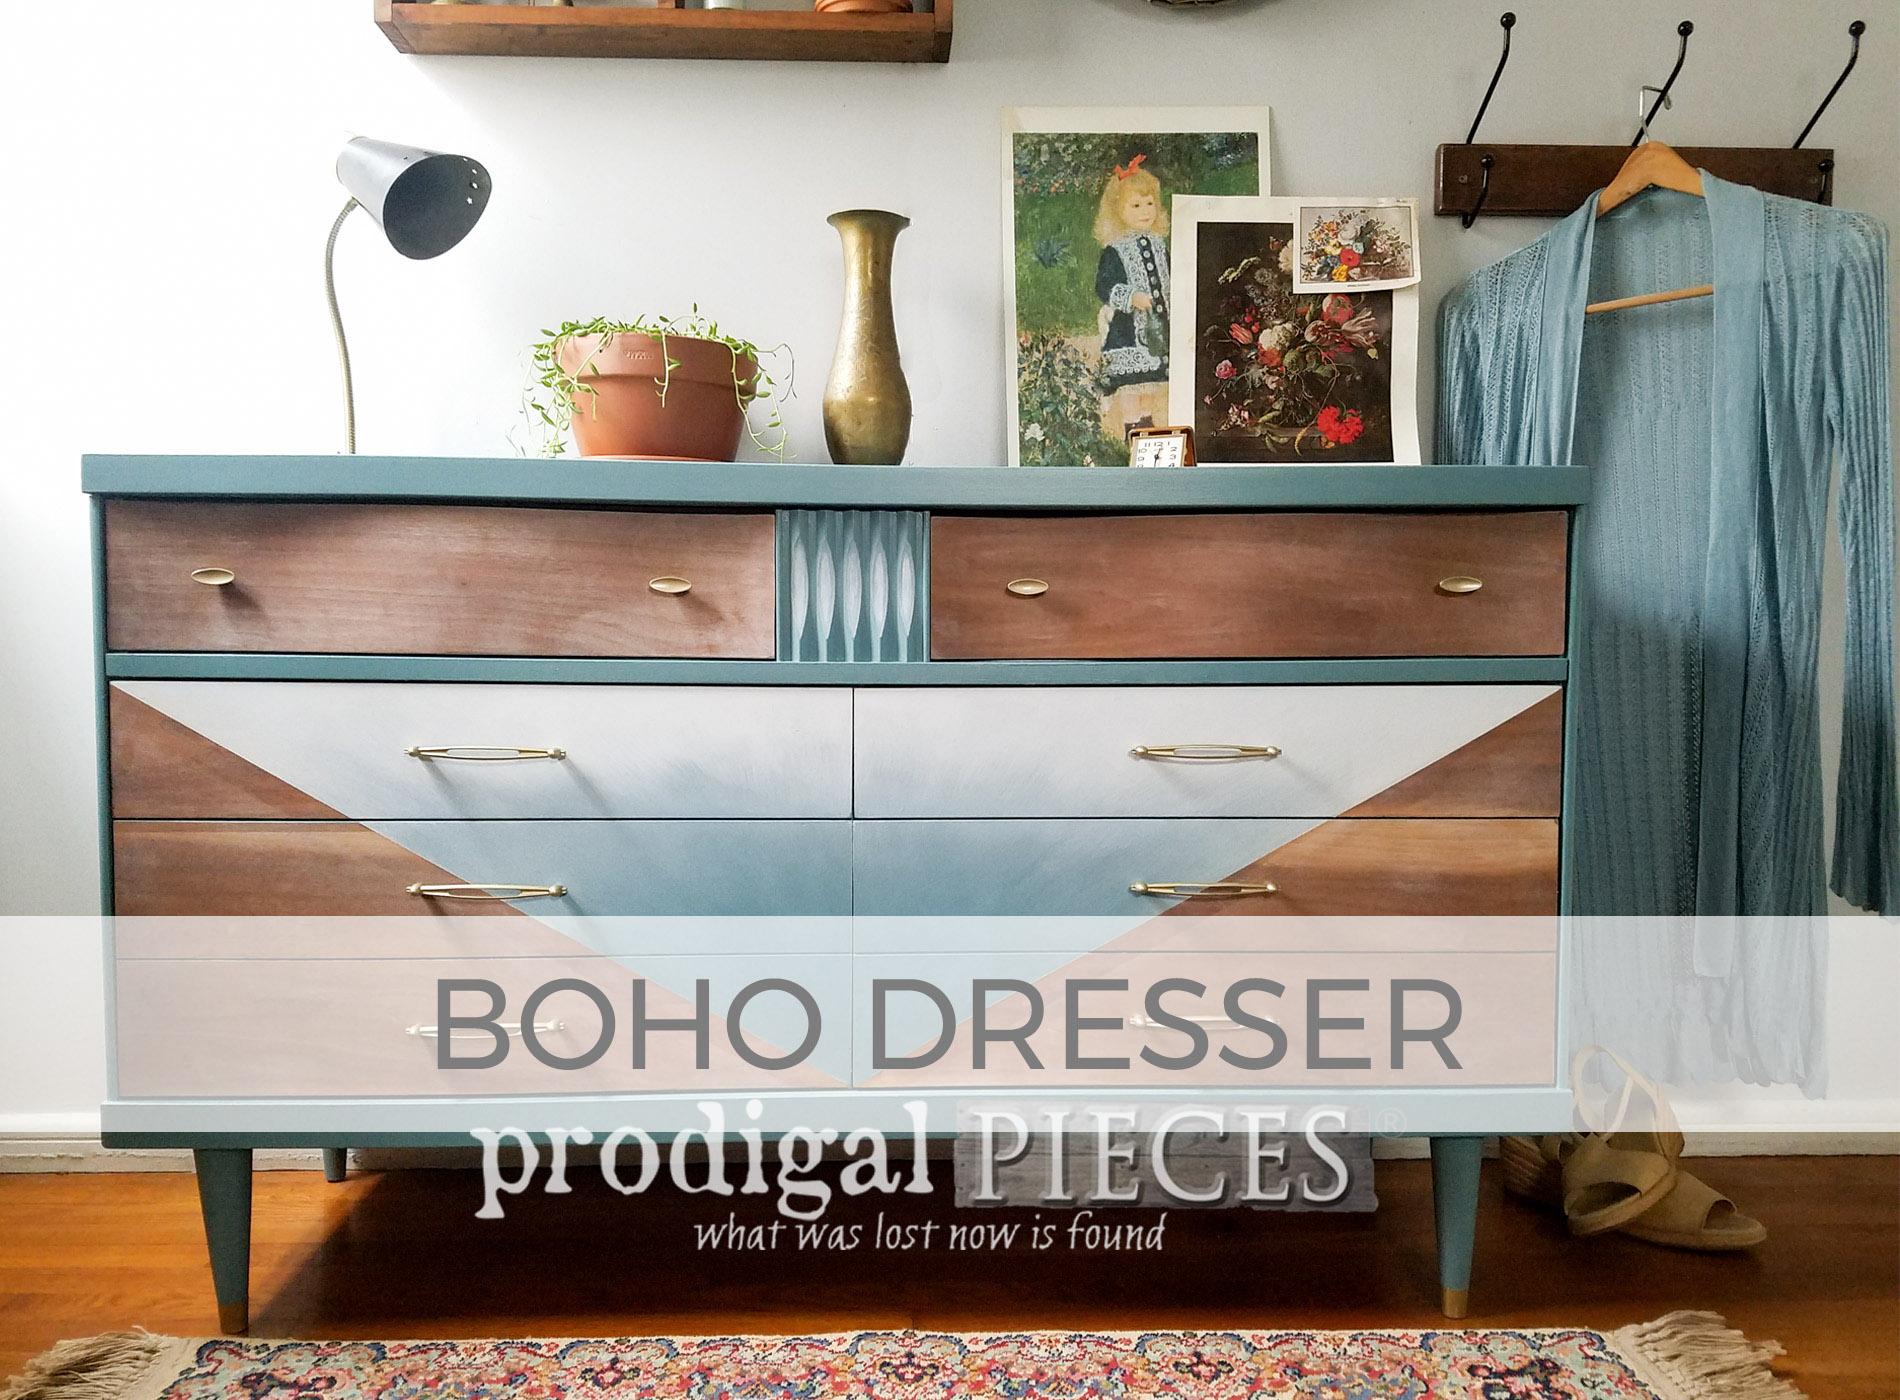 Vintage Boho Style Dresser by Larissa of Prodigal Pieces | prodigalpieces.com